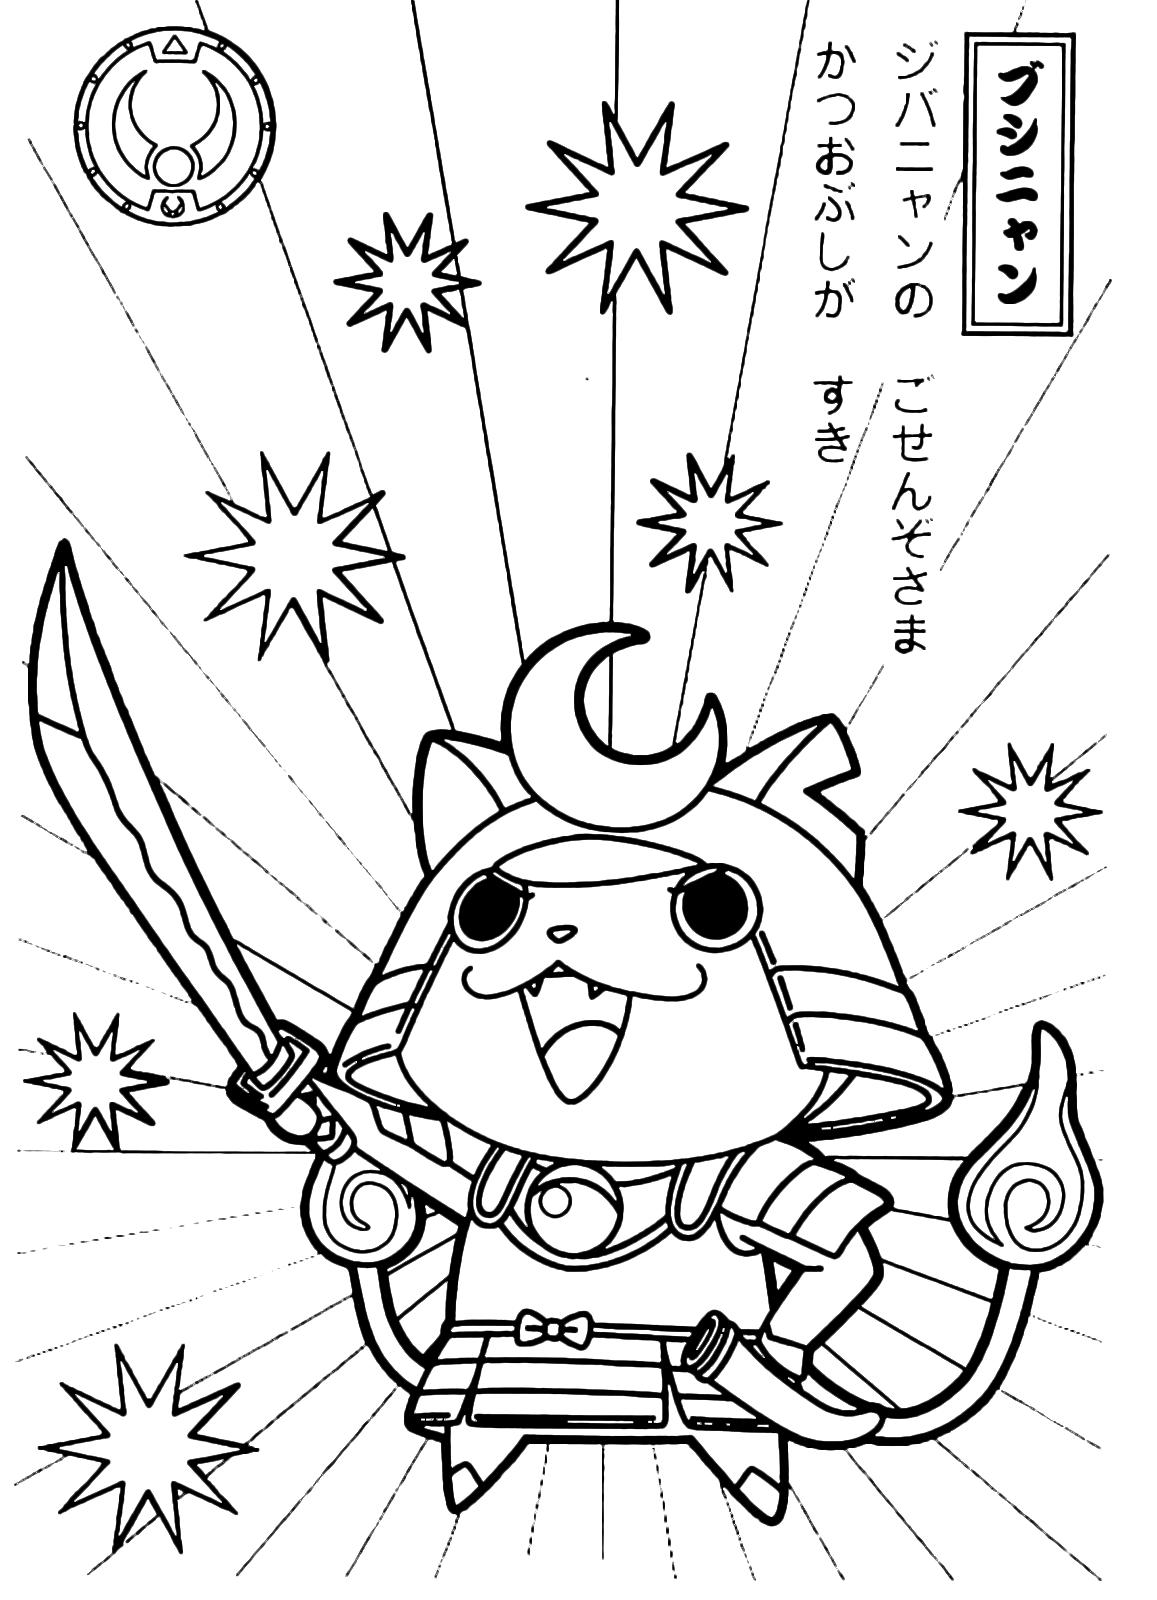 Yo kai Watch   Yo kai Shogunyan with his sword